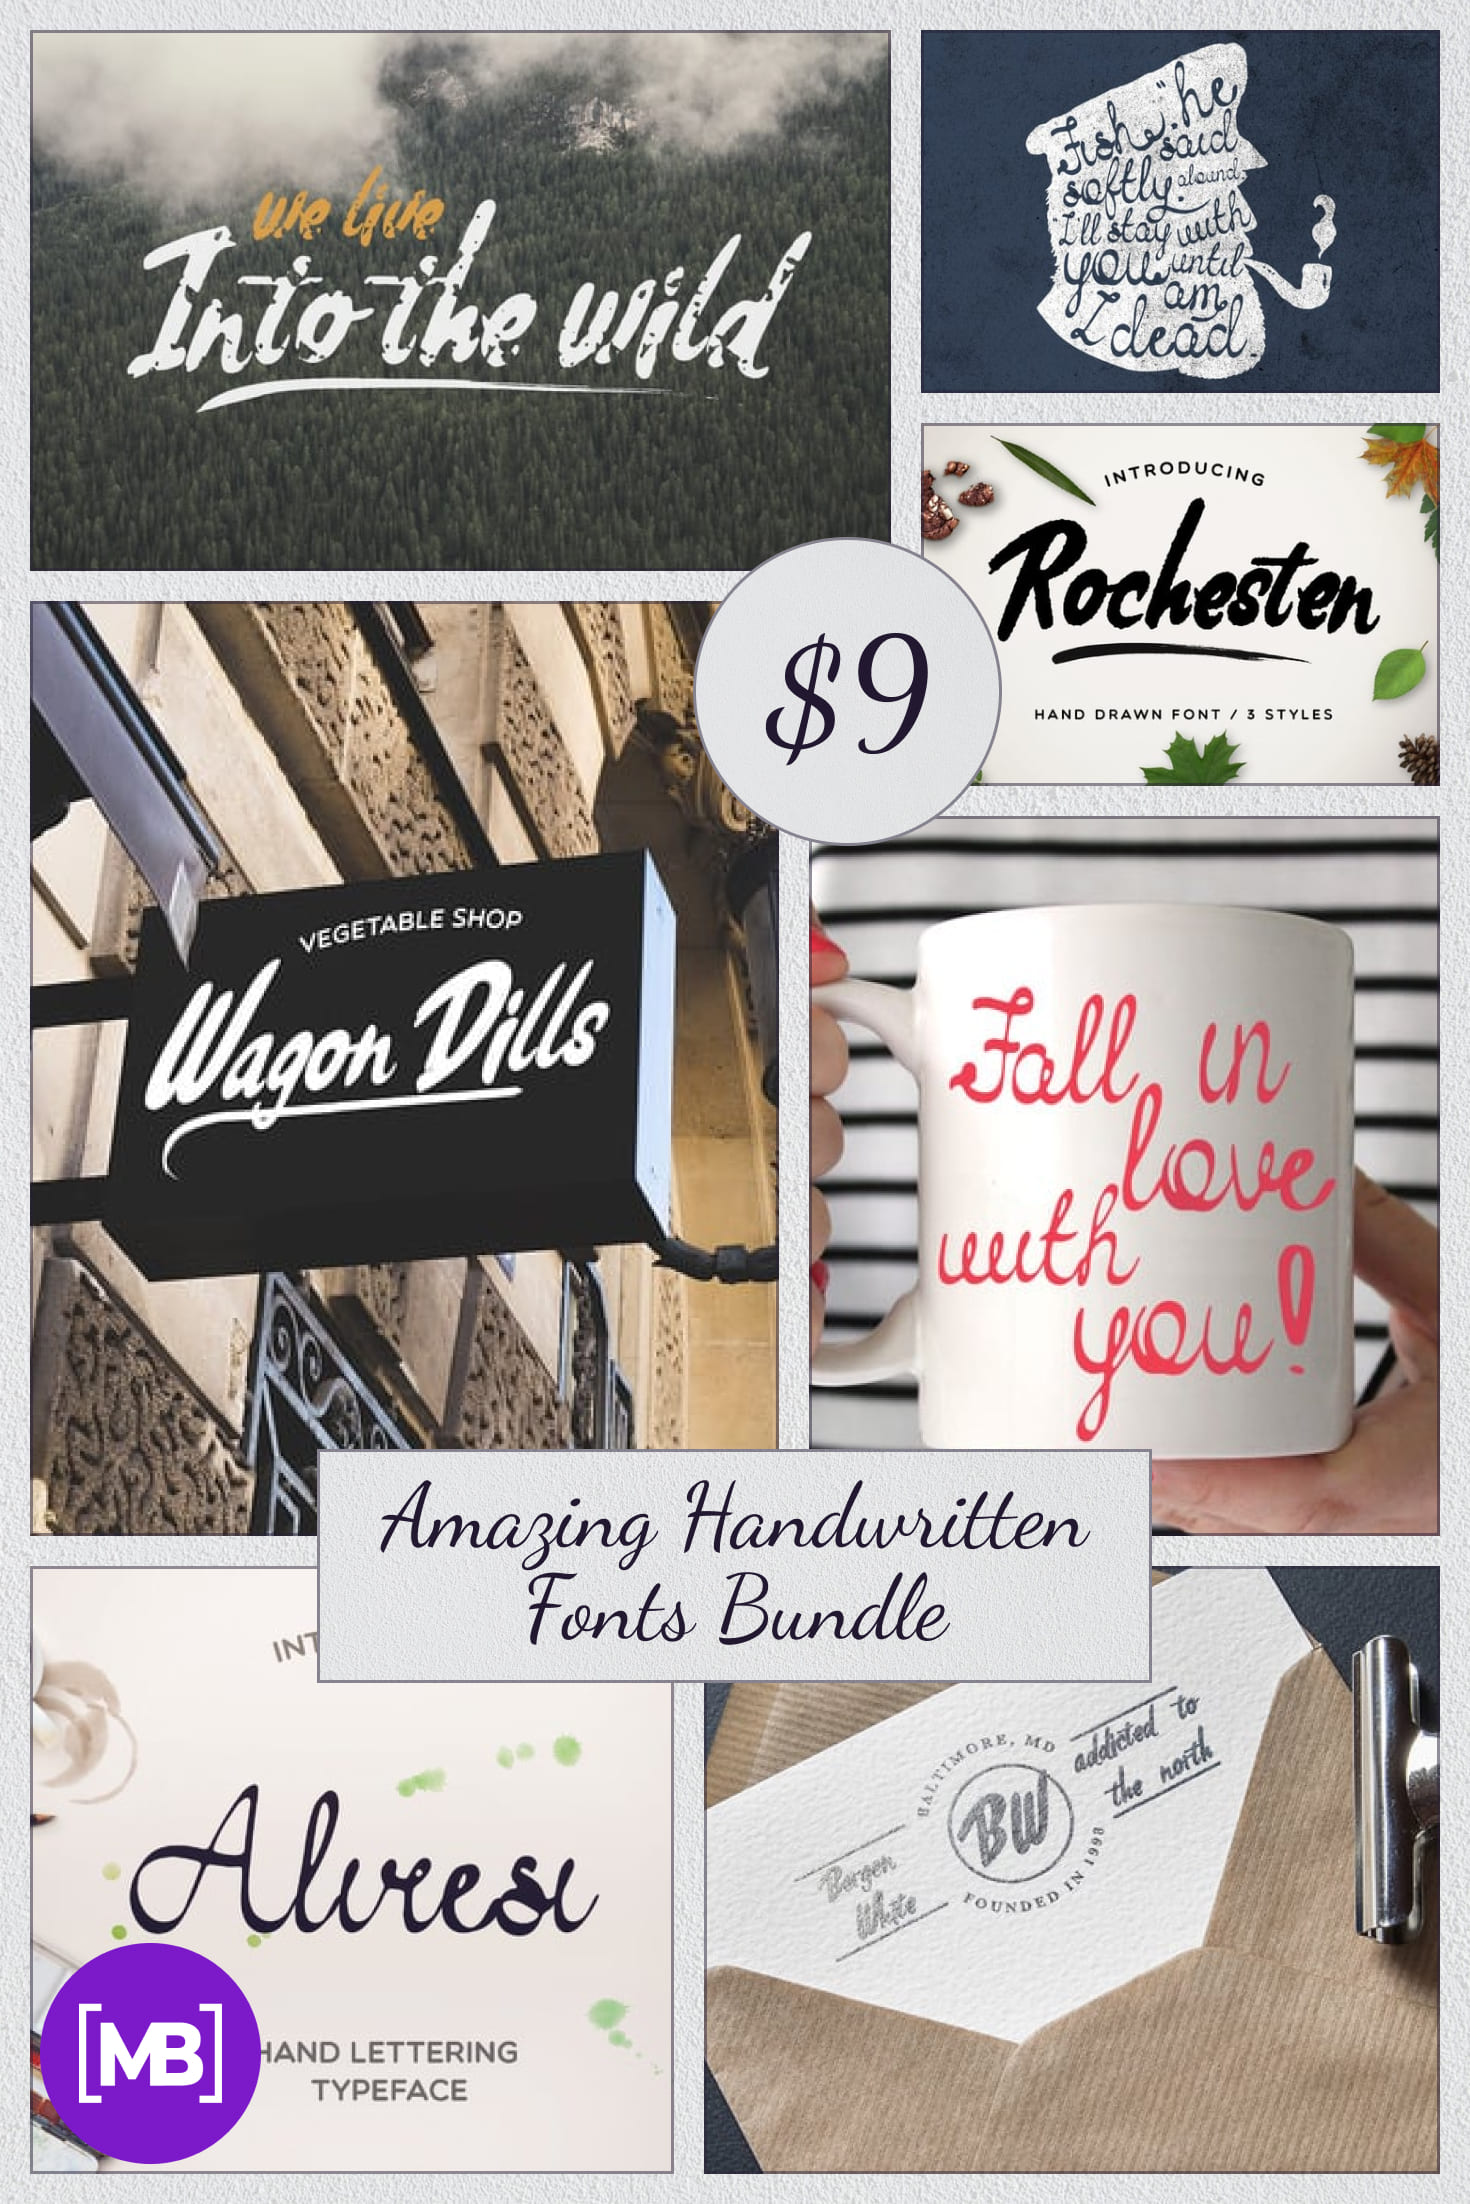 Amazing Handwritten Fonts Bundle - just $9. Collage Image.